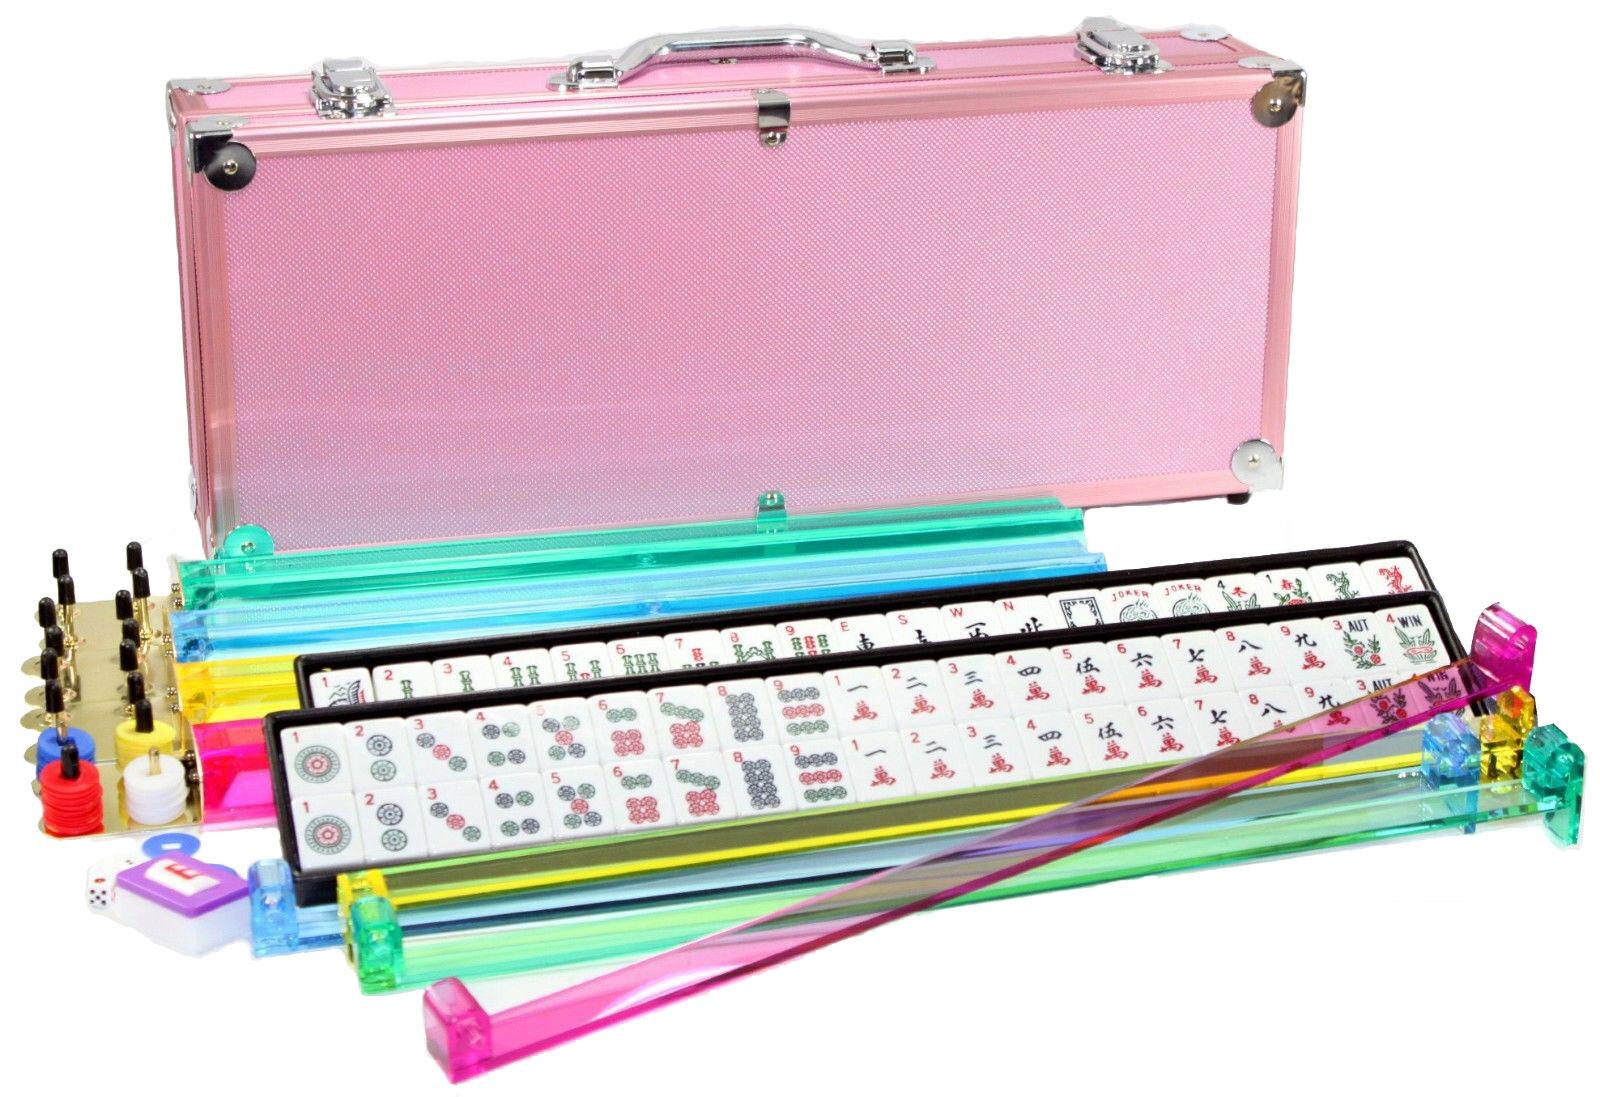 4 poussoirs + Brand New American Mahjong Western Mahjongg Set Rose Case 166 tuiles